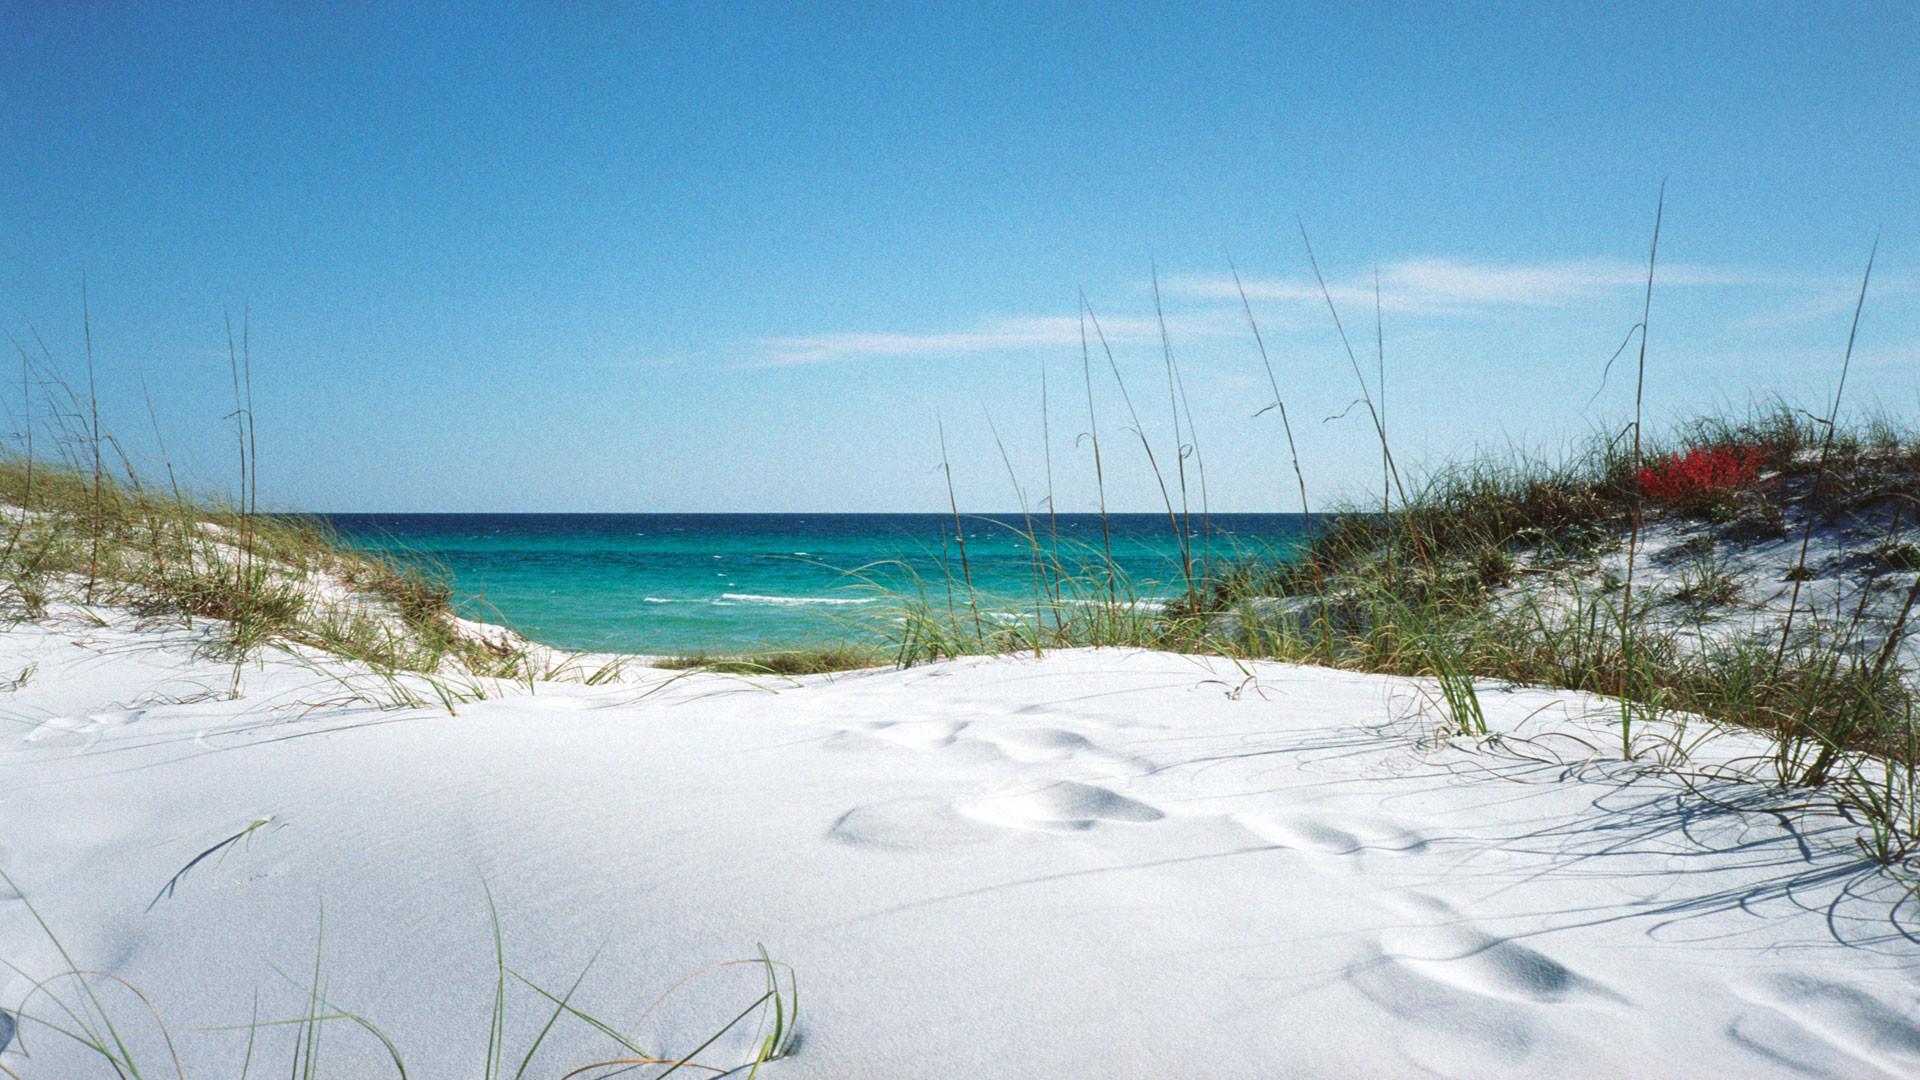 beach christmas wallpaper for desktop (50+ images)